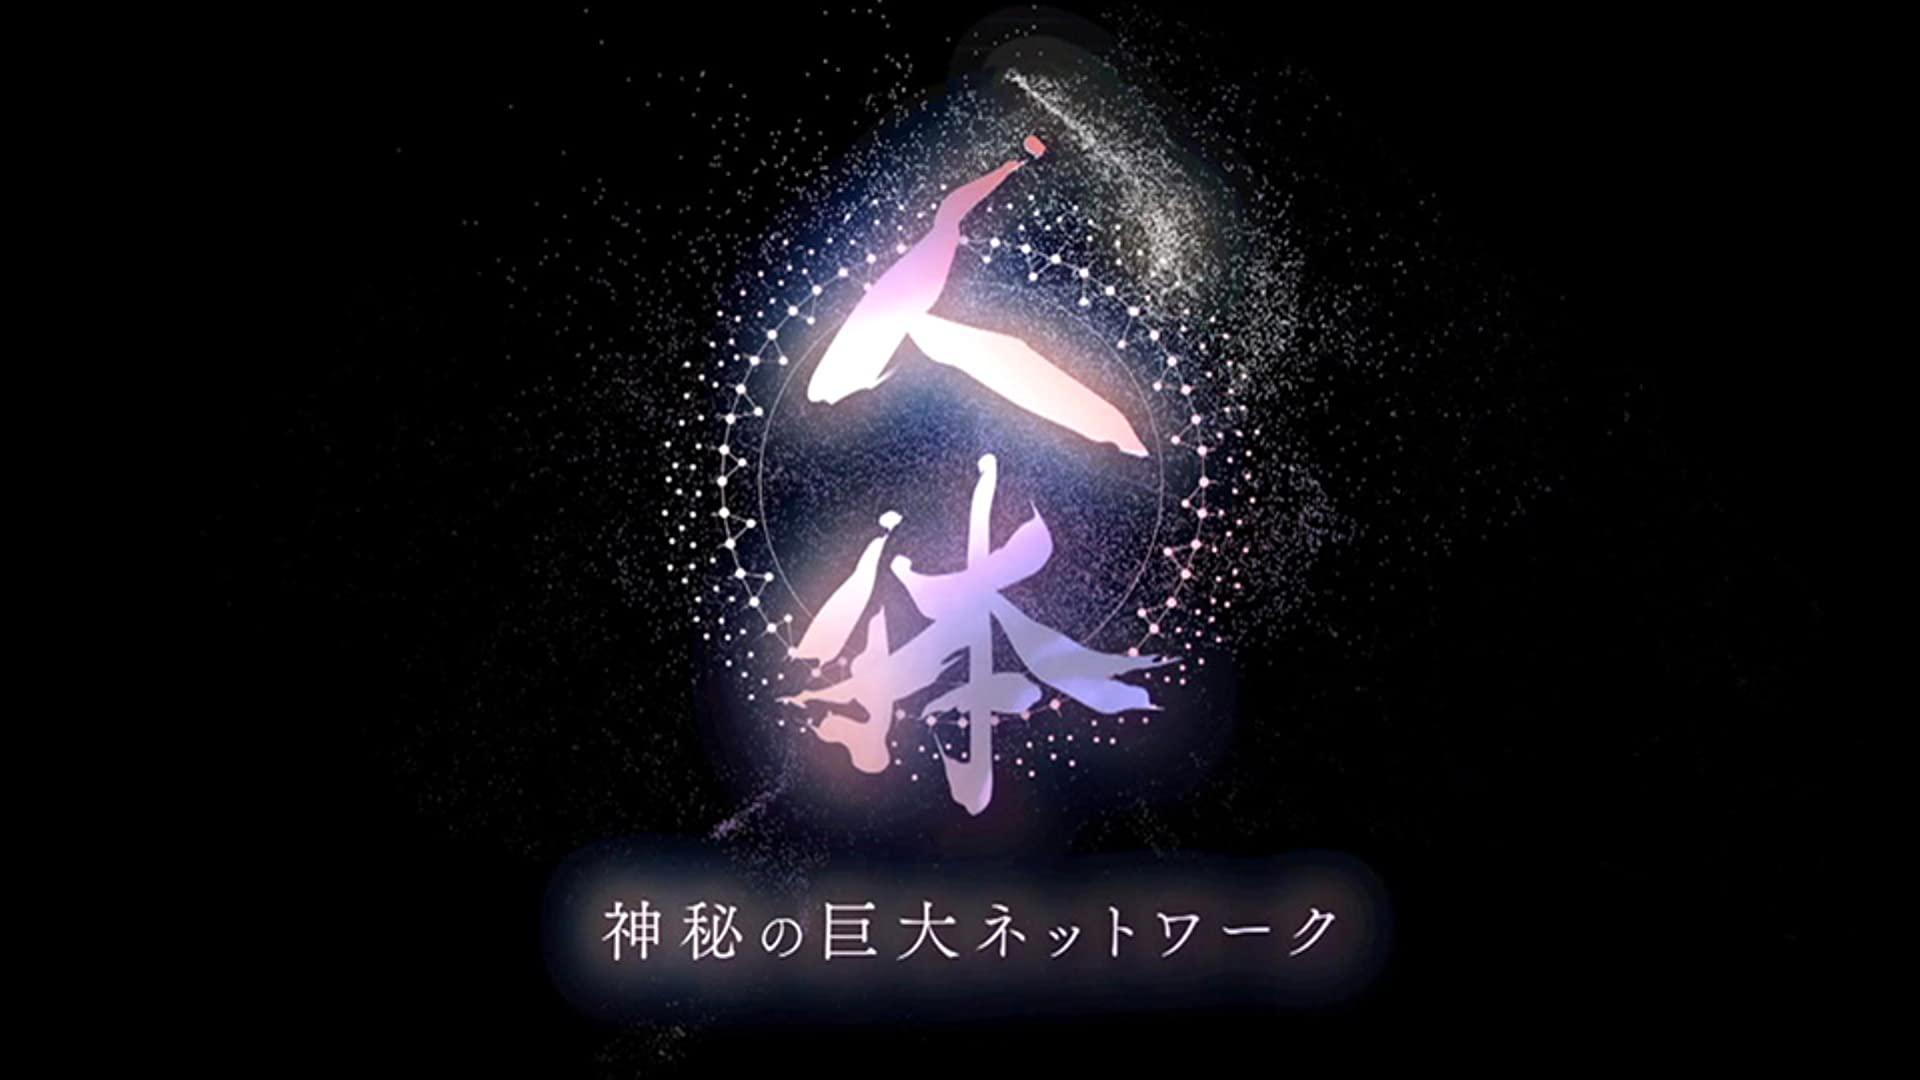 NHKスペシャル シリーズ 人体 神秘の巨大ネットワーク(NHKオンデマンド)